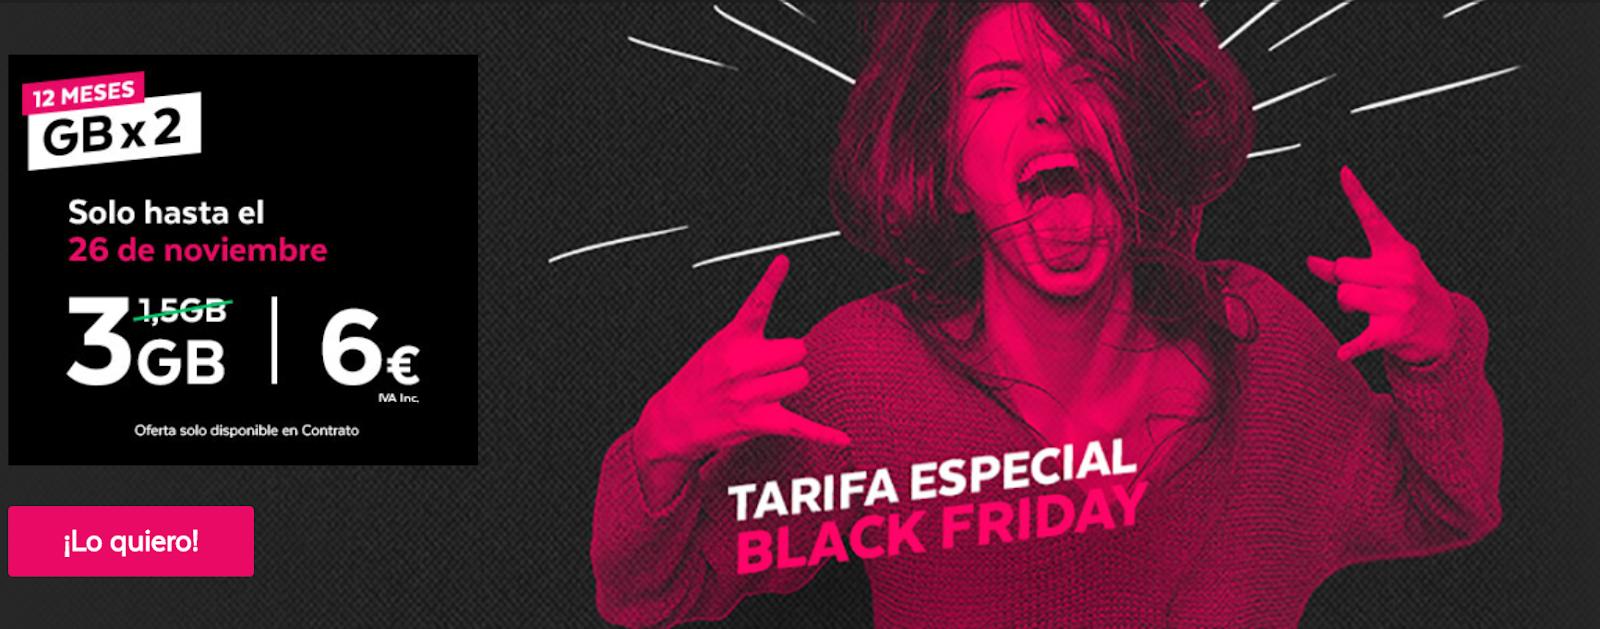 Black Friday Tuenti